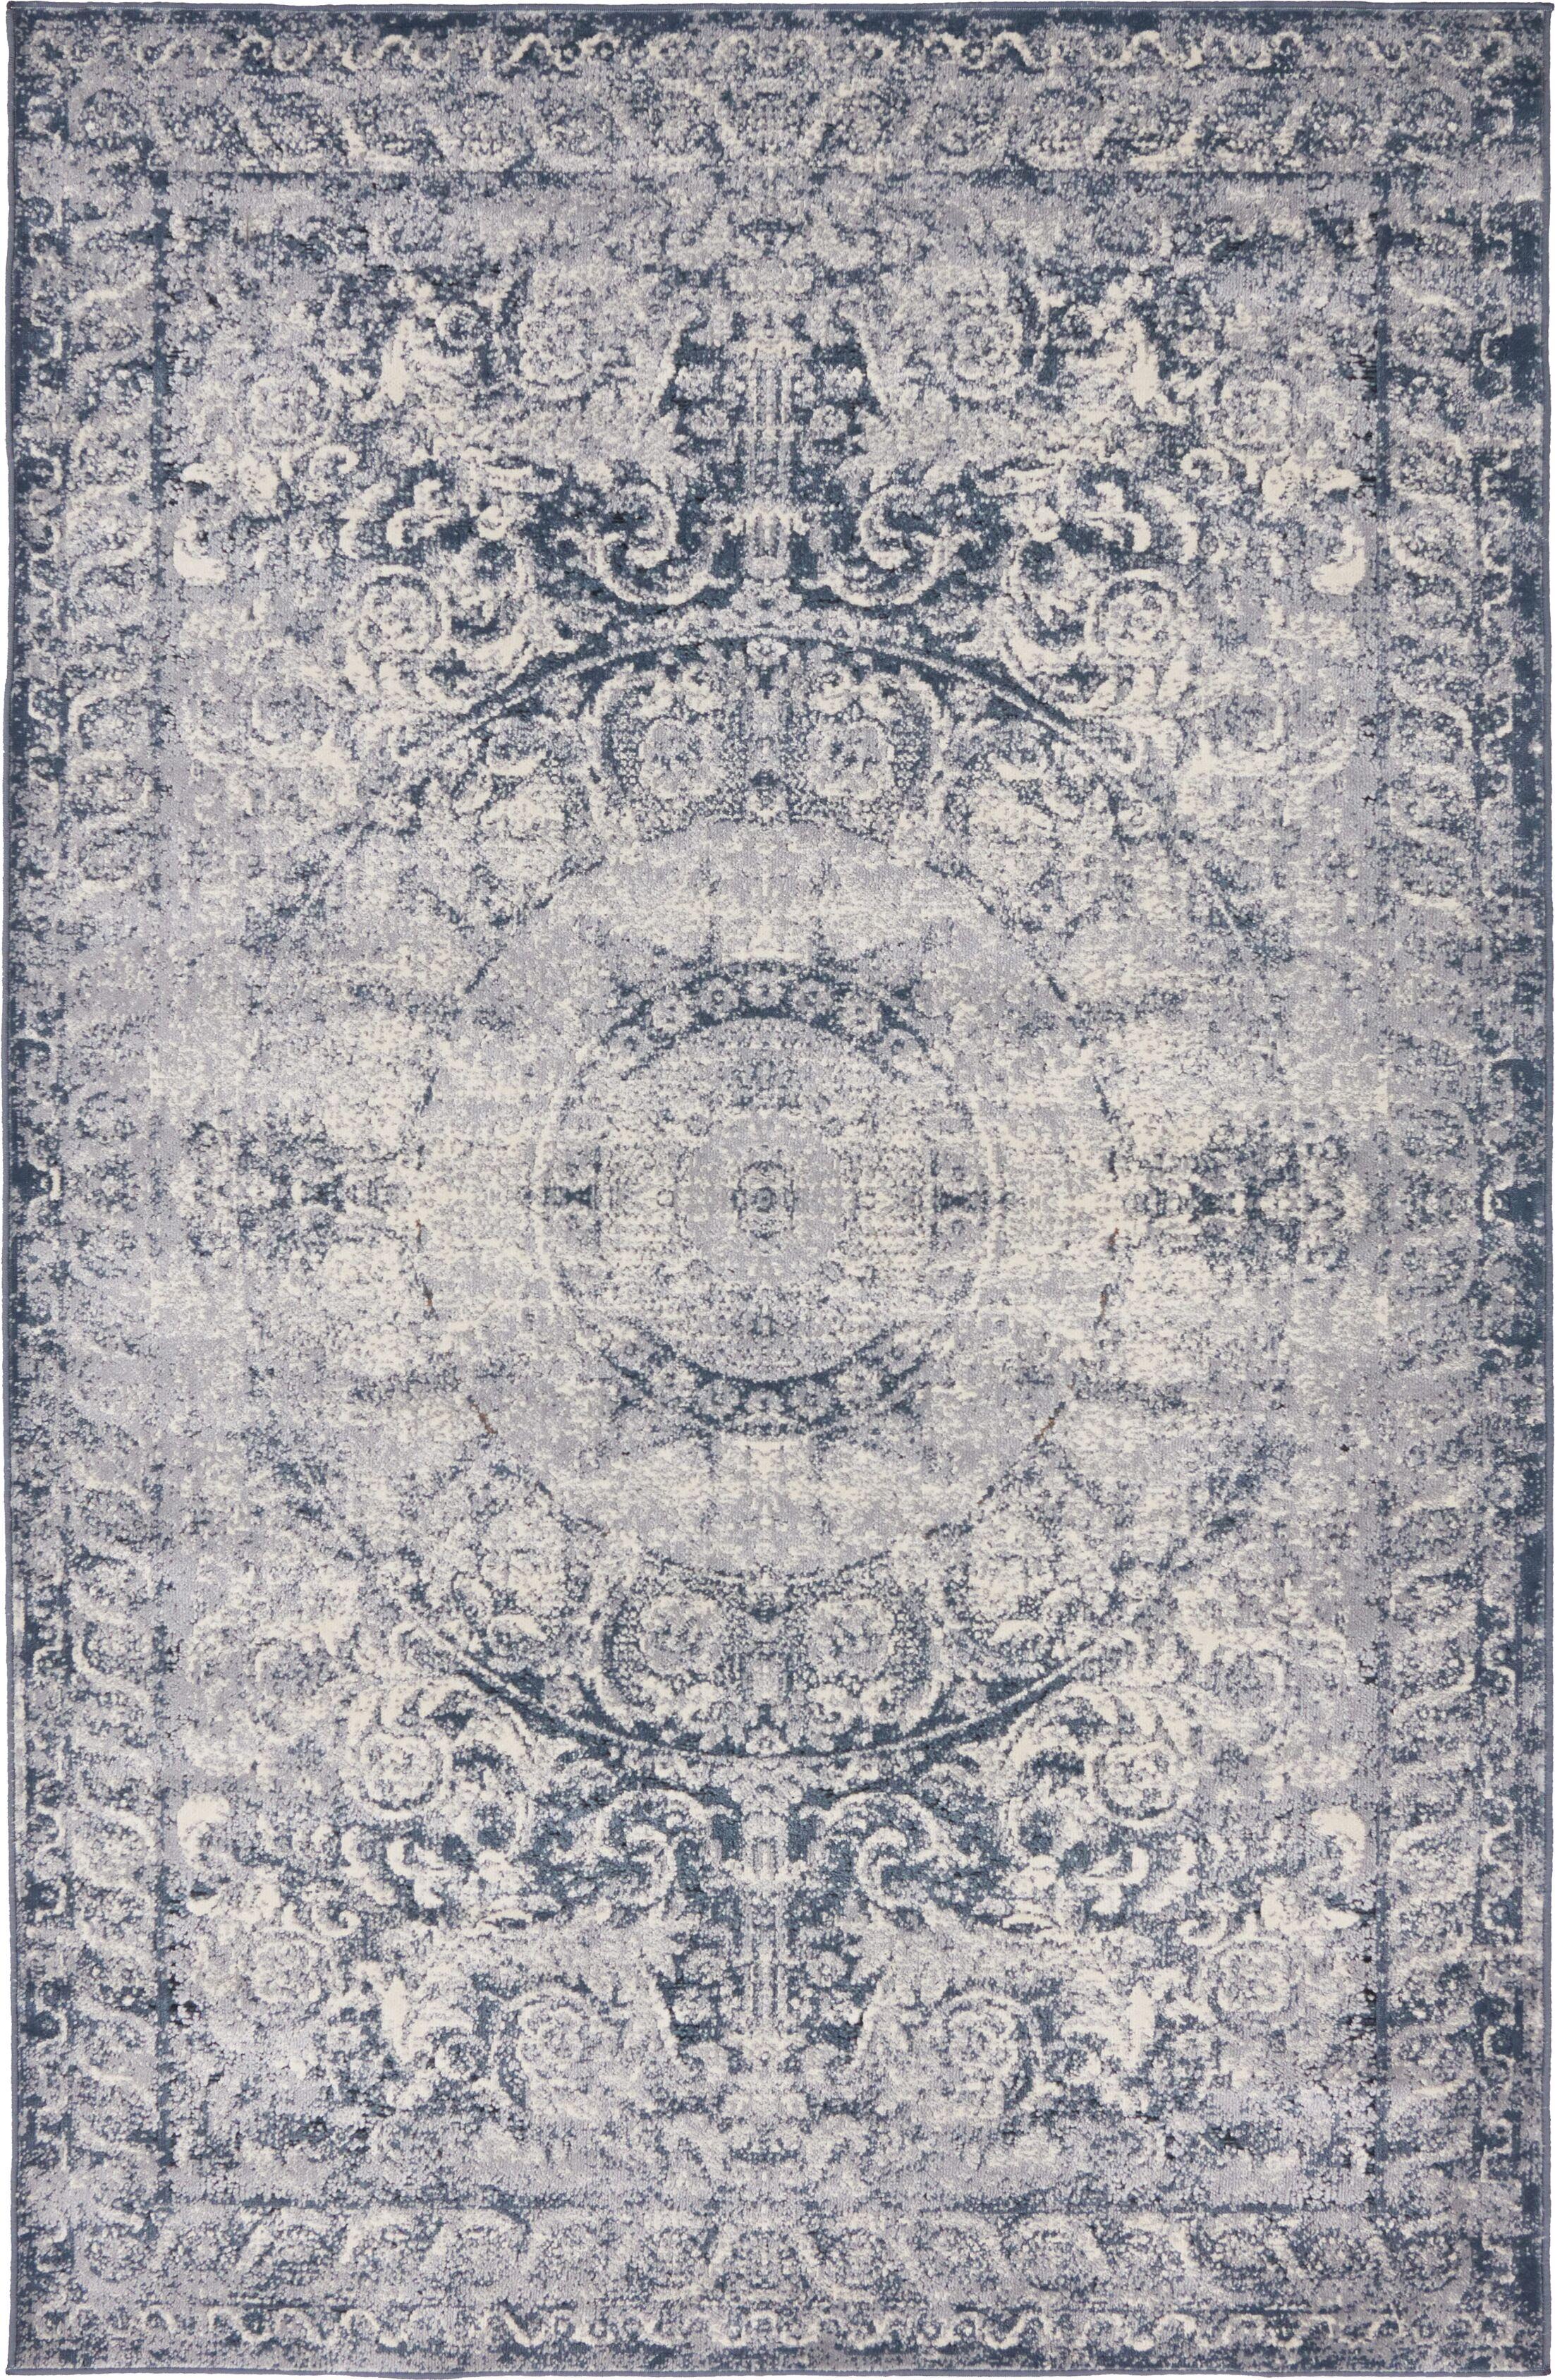 Abbeville Stone Blue Area Rug Rug Size: Rectangle 4' x 6'